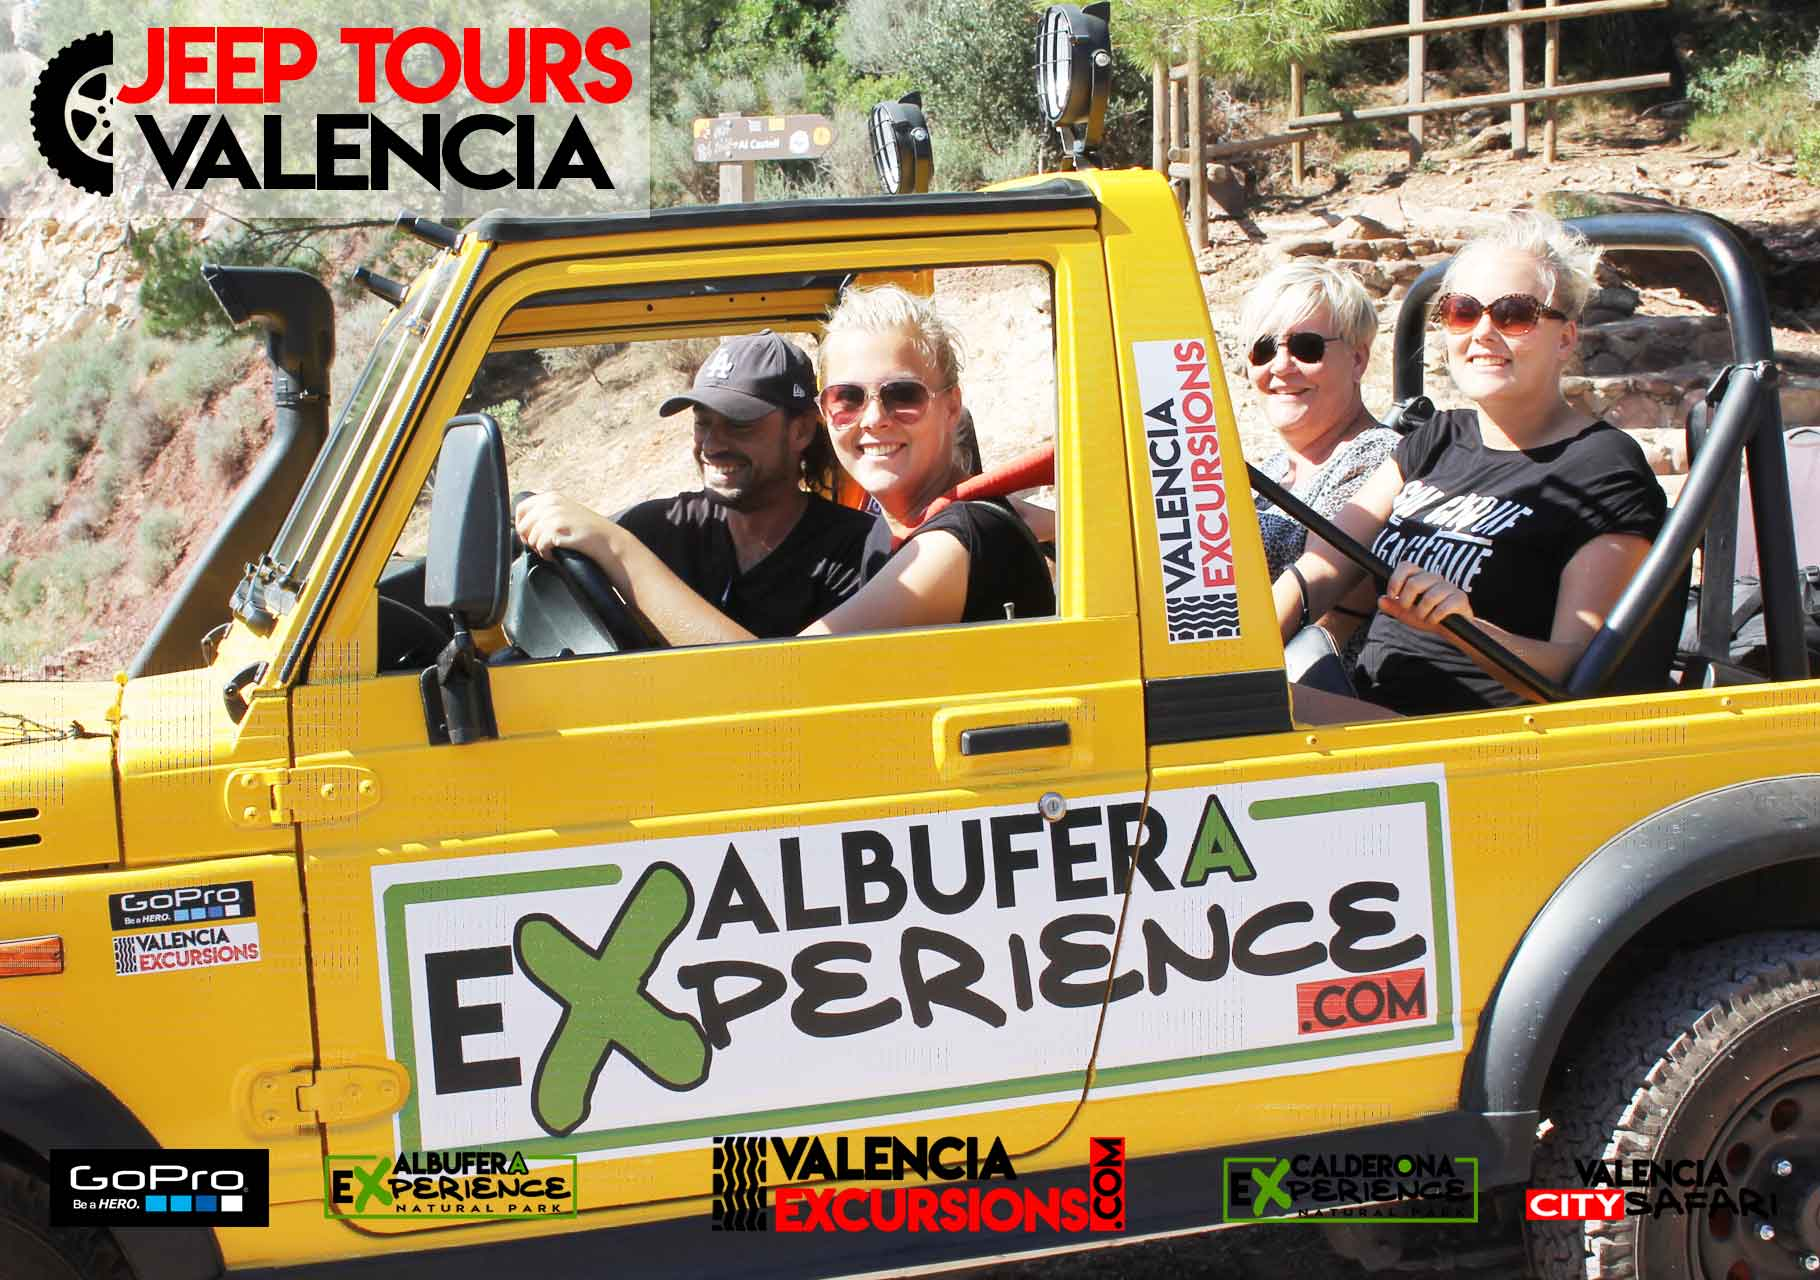 Albufera National Park Jeep Tour in Valencia